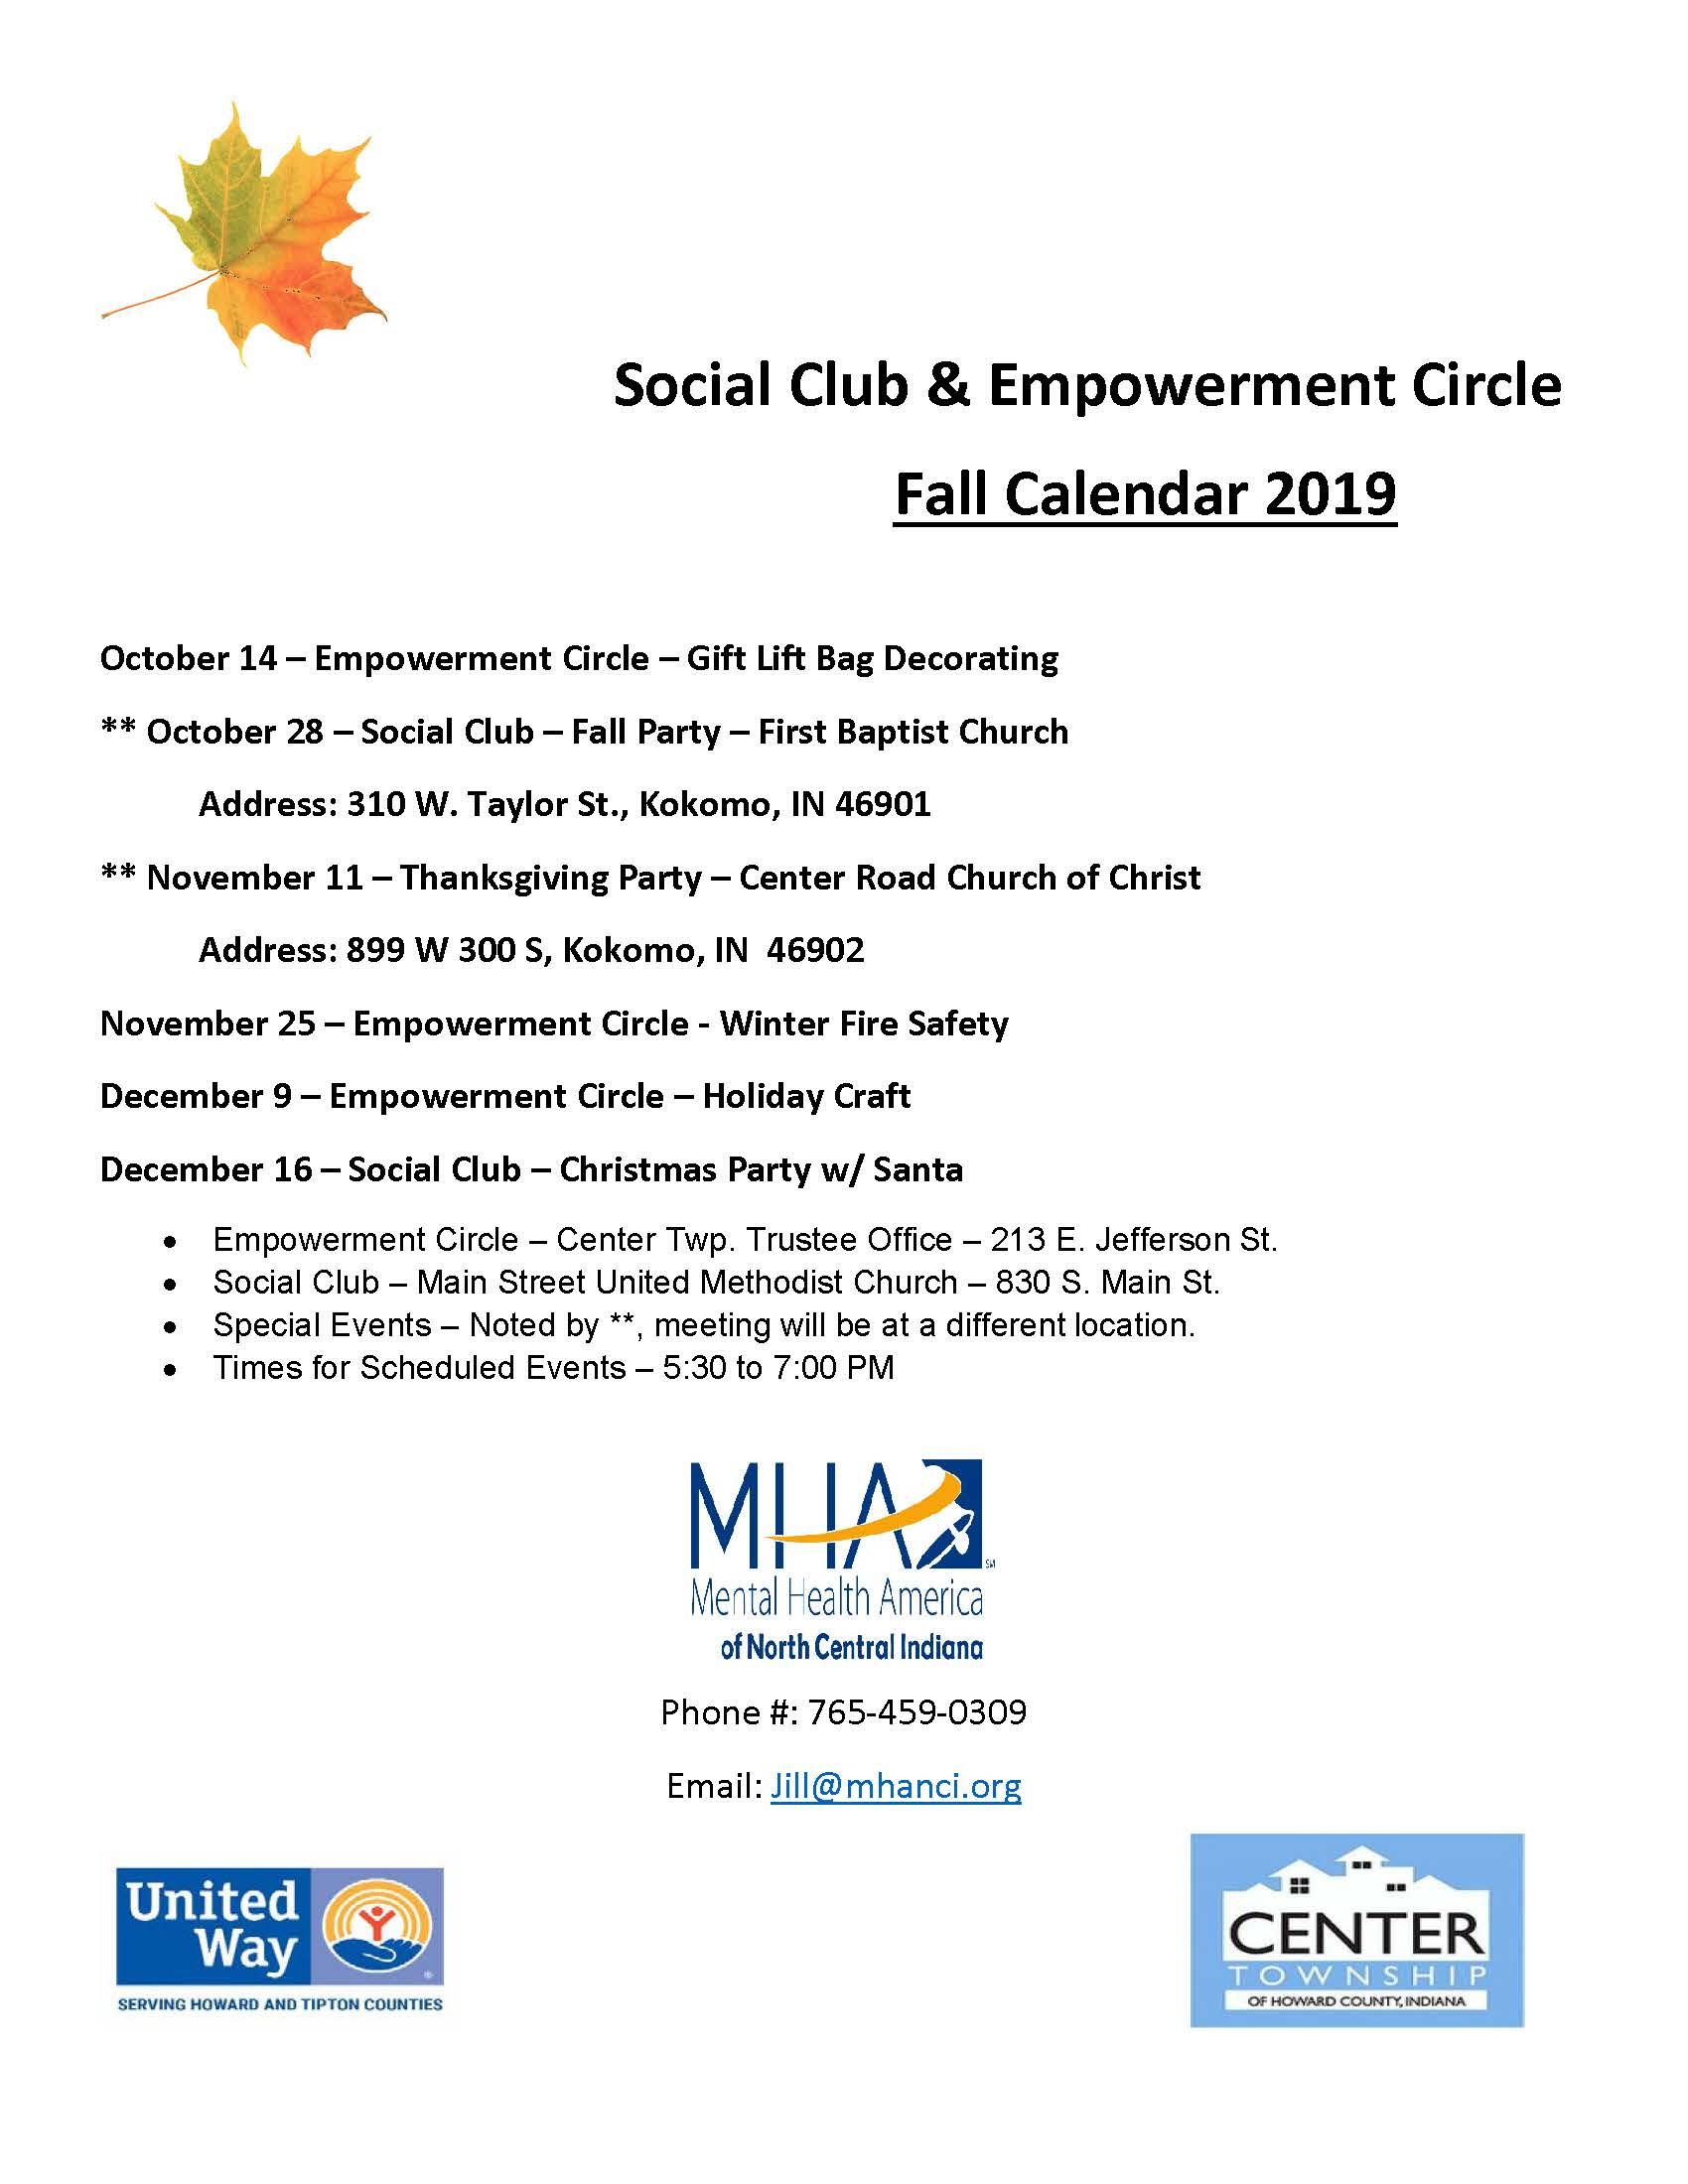 Empowerment Circle